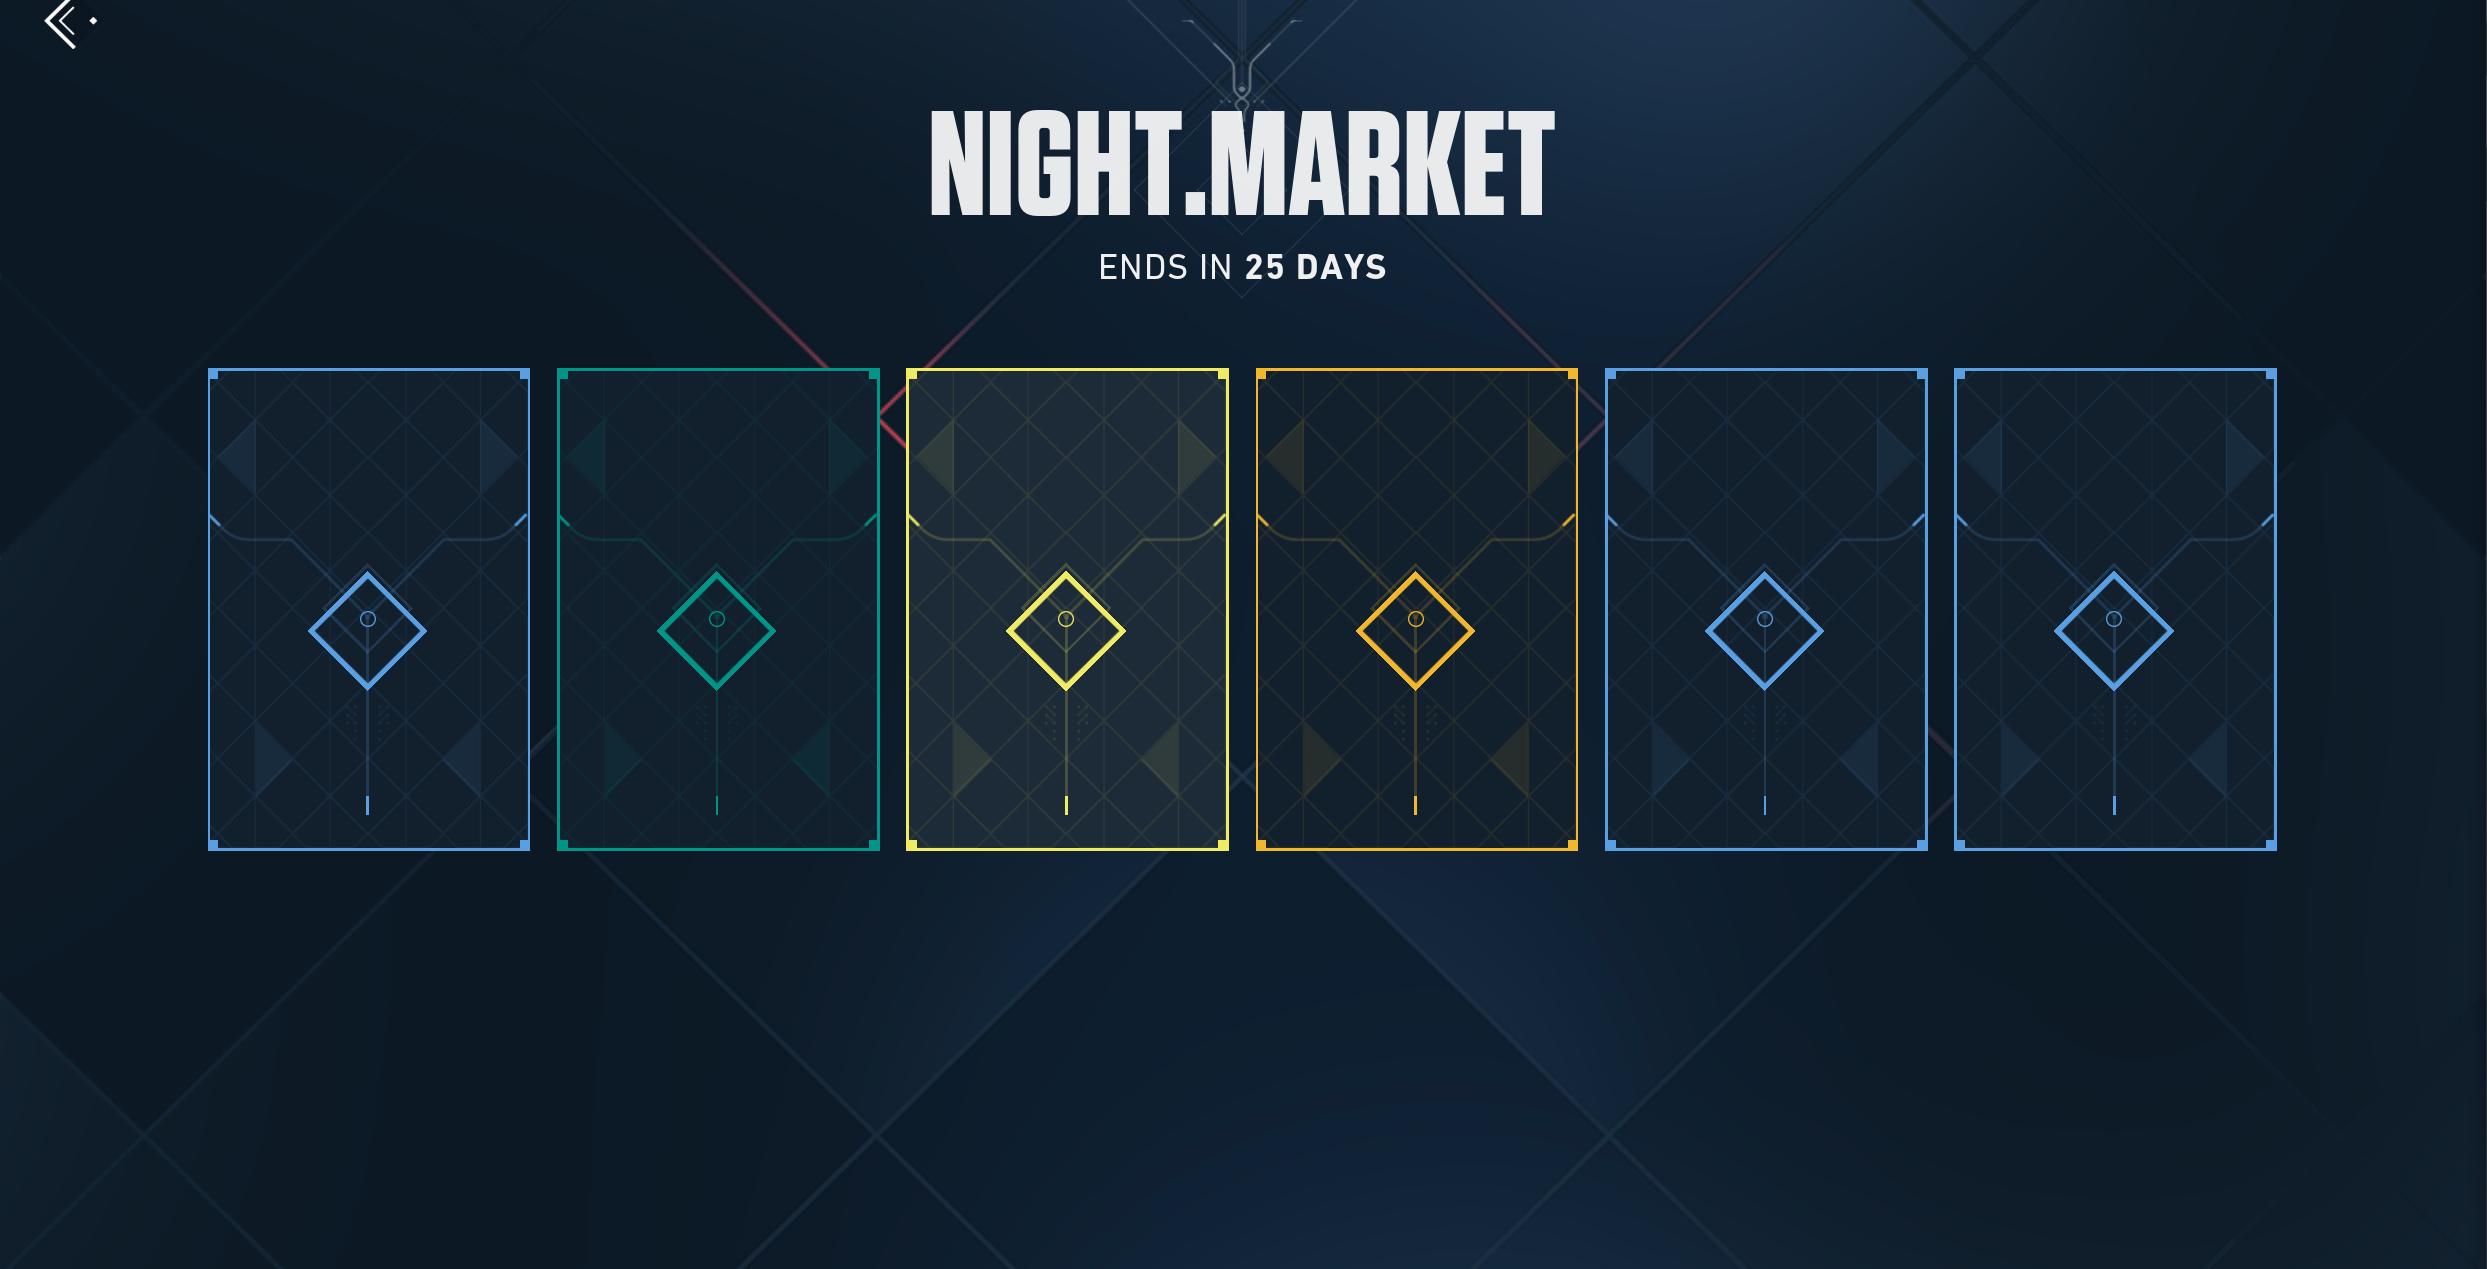 Night.market-11302020.png